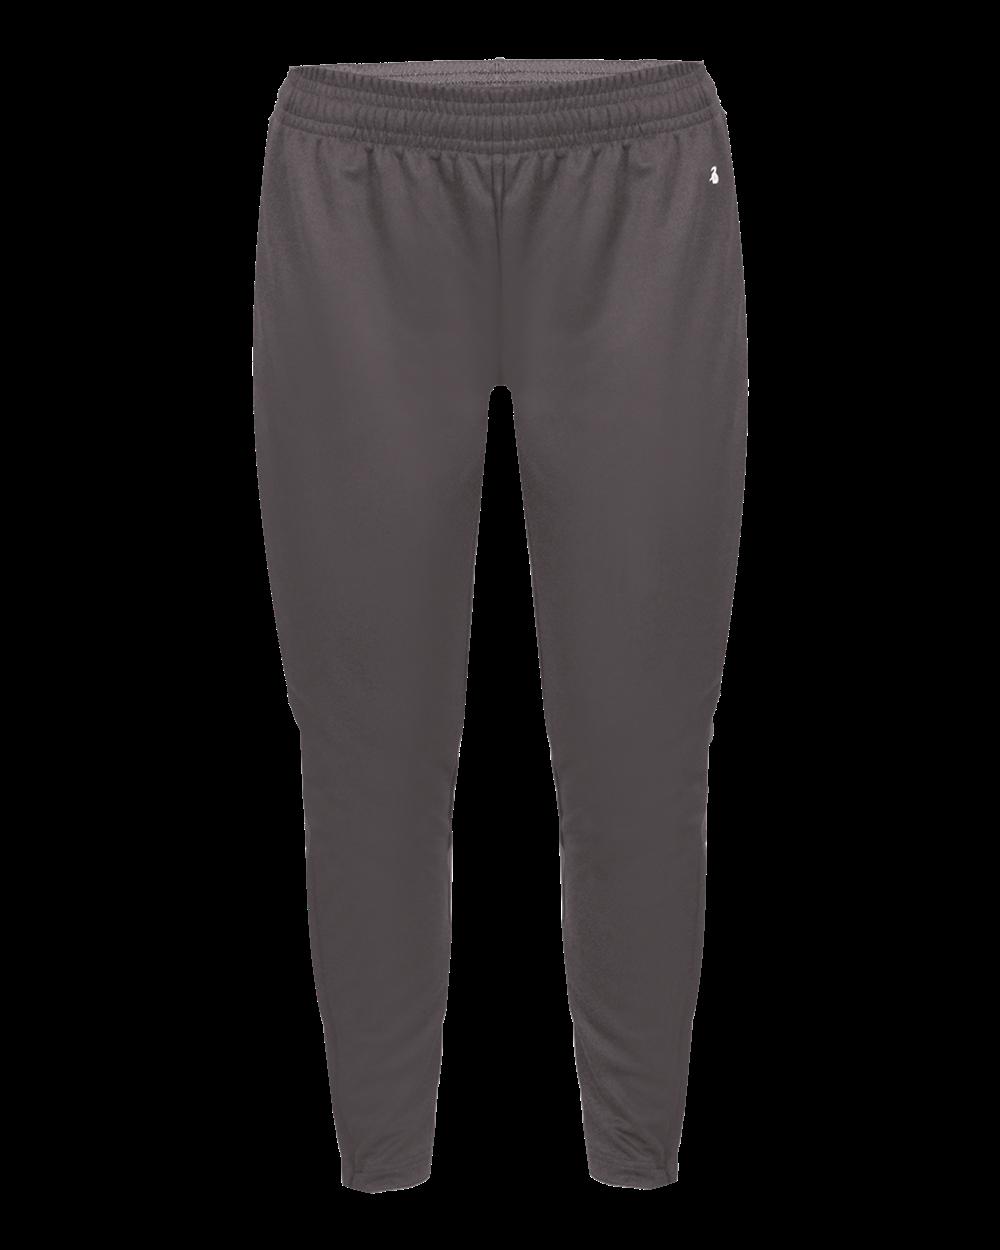 Trainer Women's Pant - Graphite